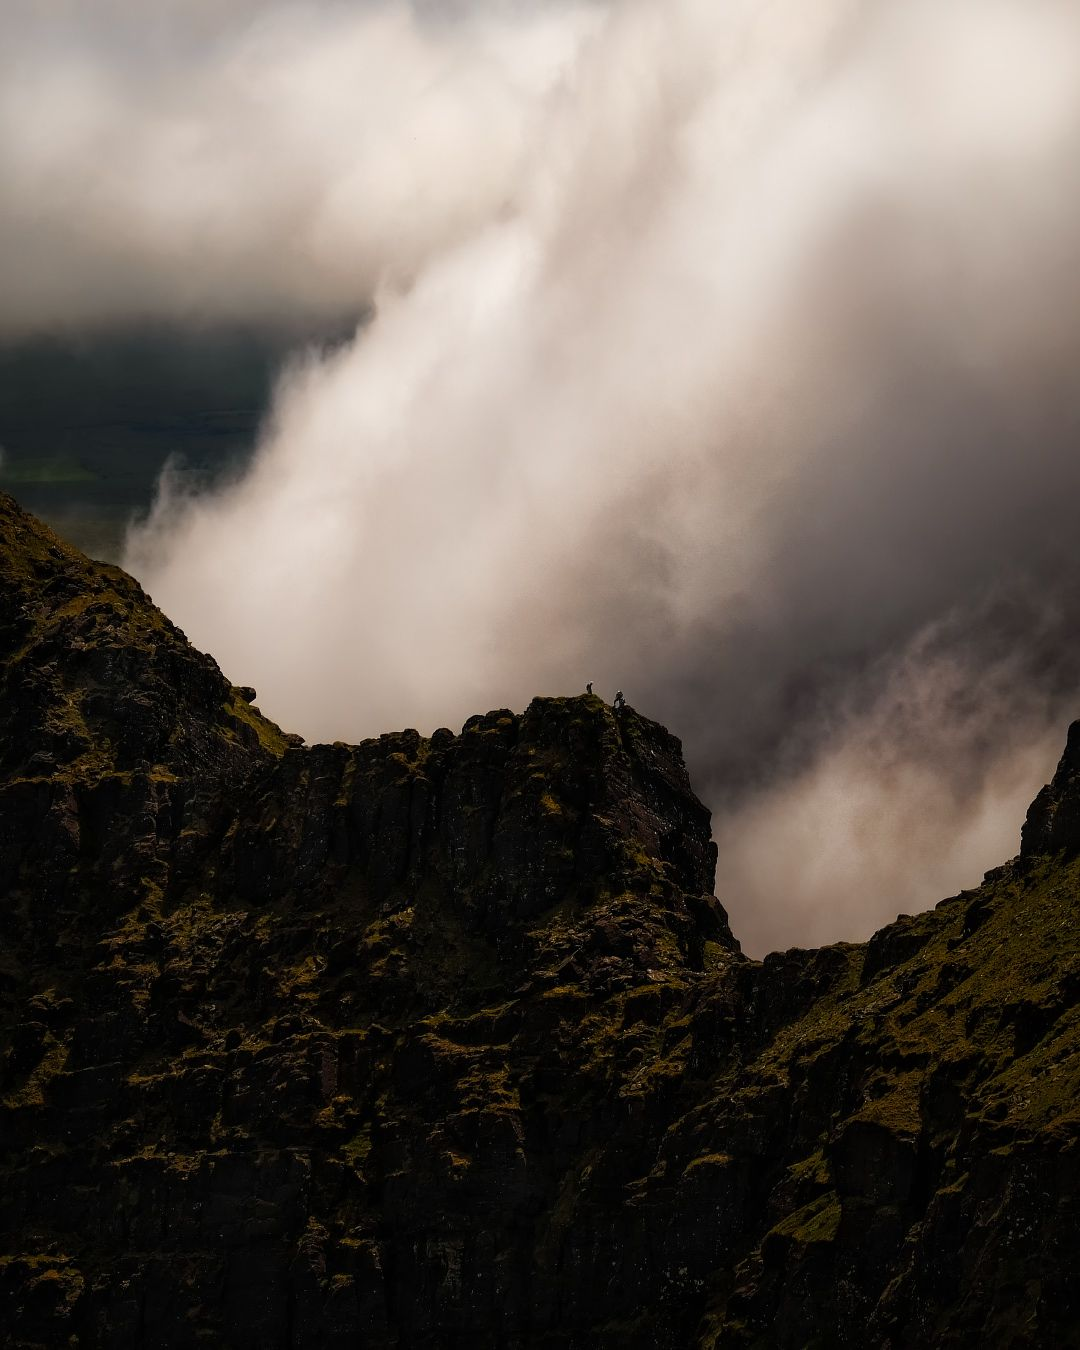 ...on the Ridge... alpinism mountaineering alpinismo climbing mountain ridge range sharp weather storm challenging ireland kerry brandon faha clouds cloudscape fog mist haze amazing breathtaking picturesque awe europe from above slopes hills